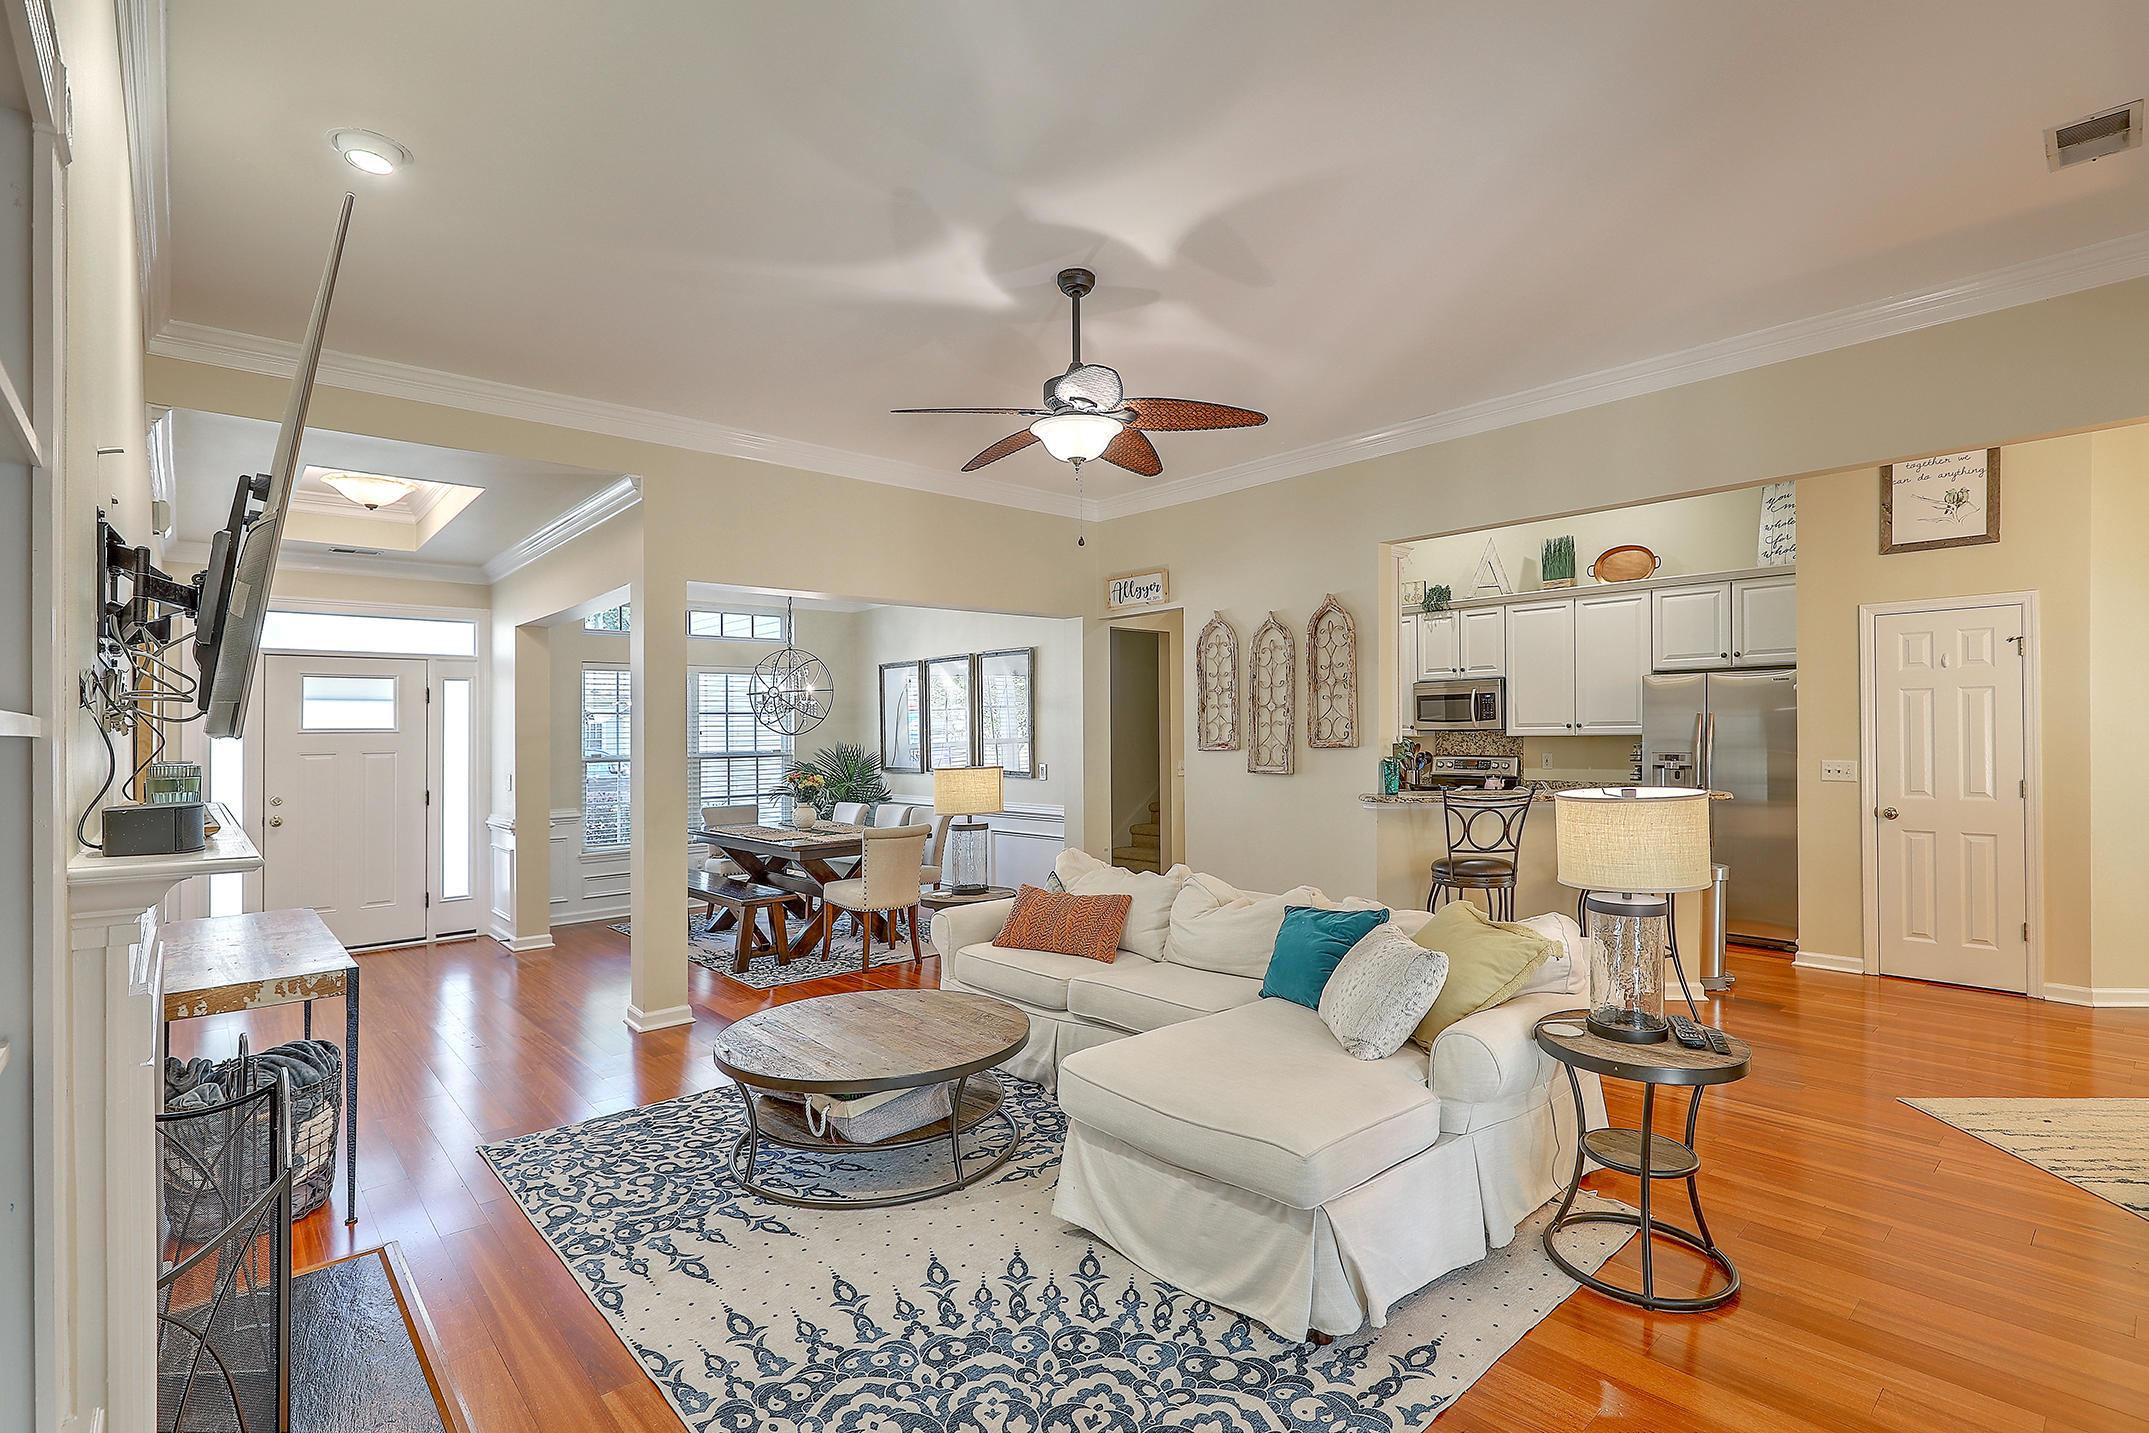 Dunes West Homes For Sale - 1471 Cypress Pointe, Mount Pleasant, SC - 25